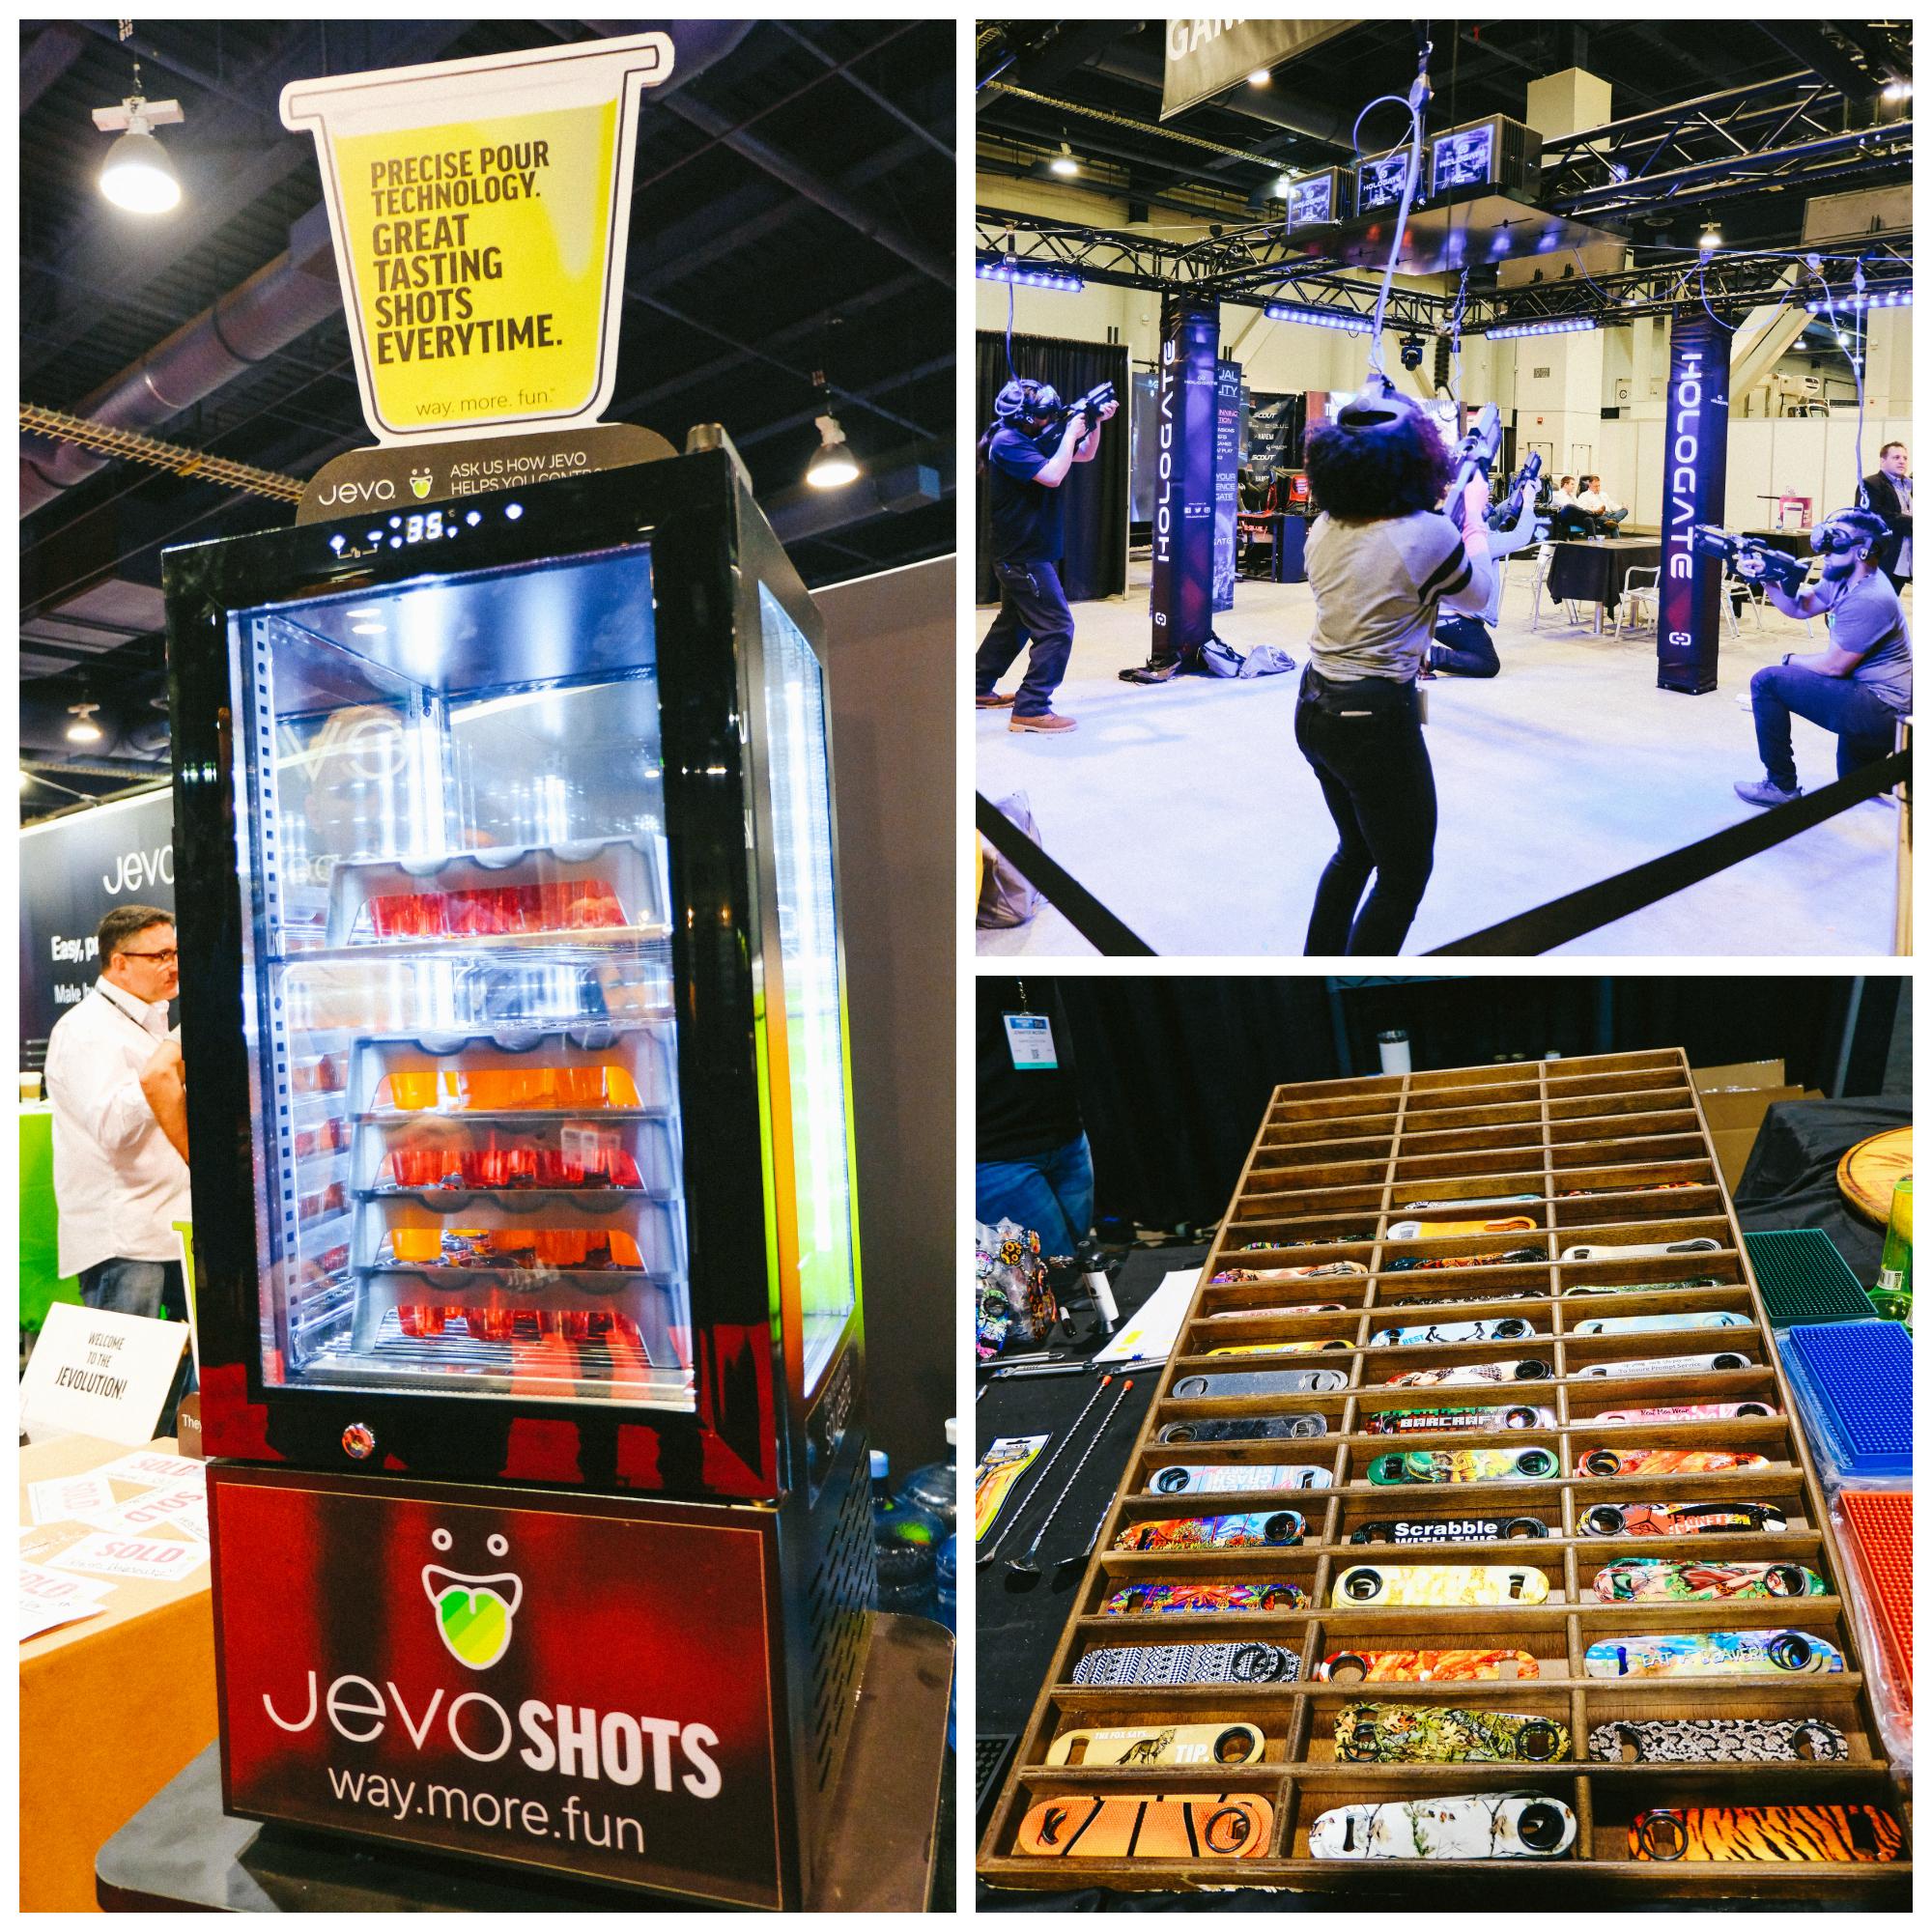 Las Vegas Nightclub and Bar Show 2018